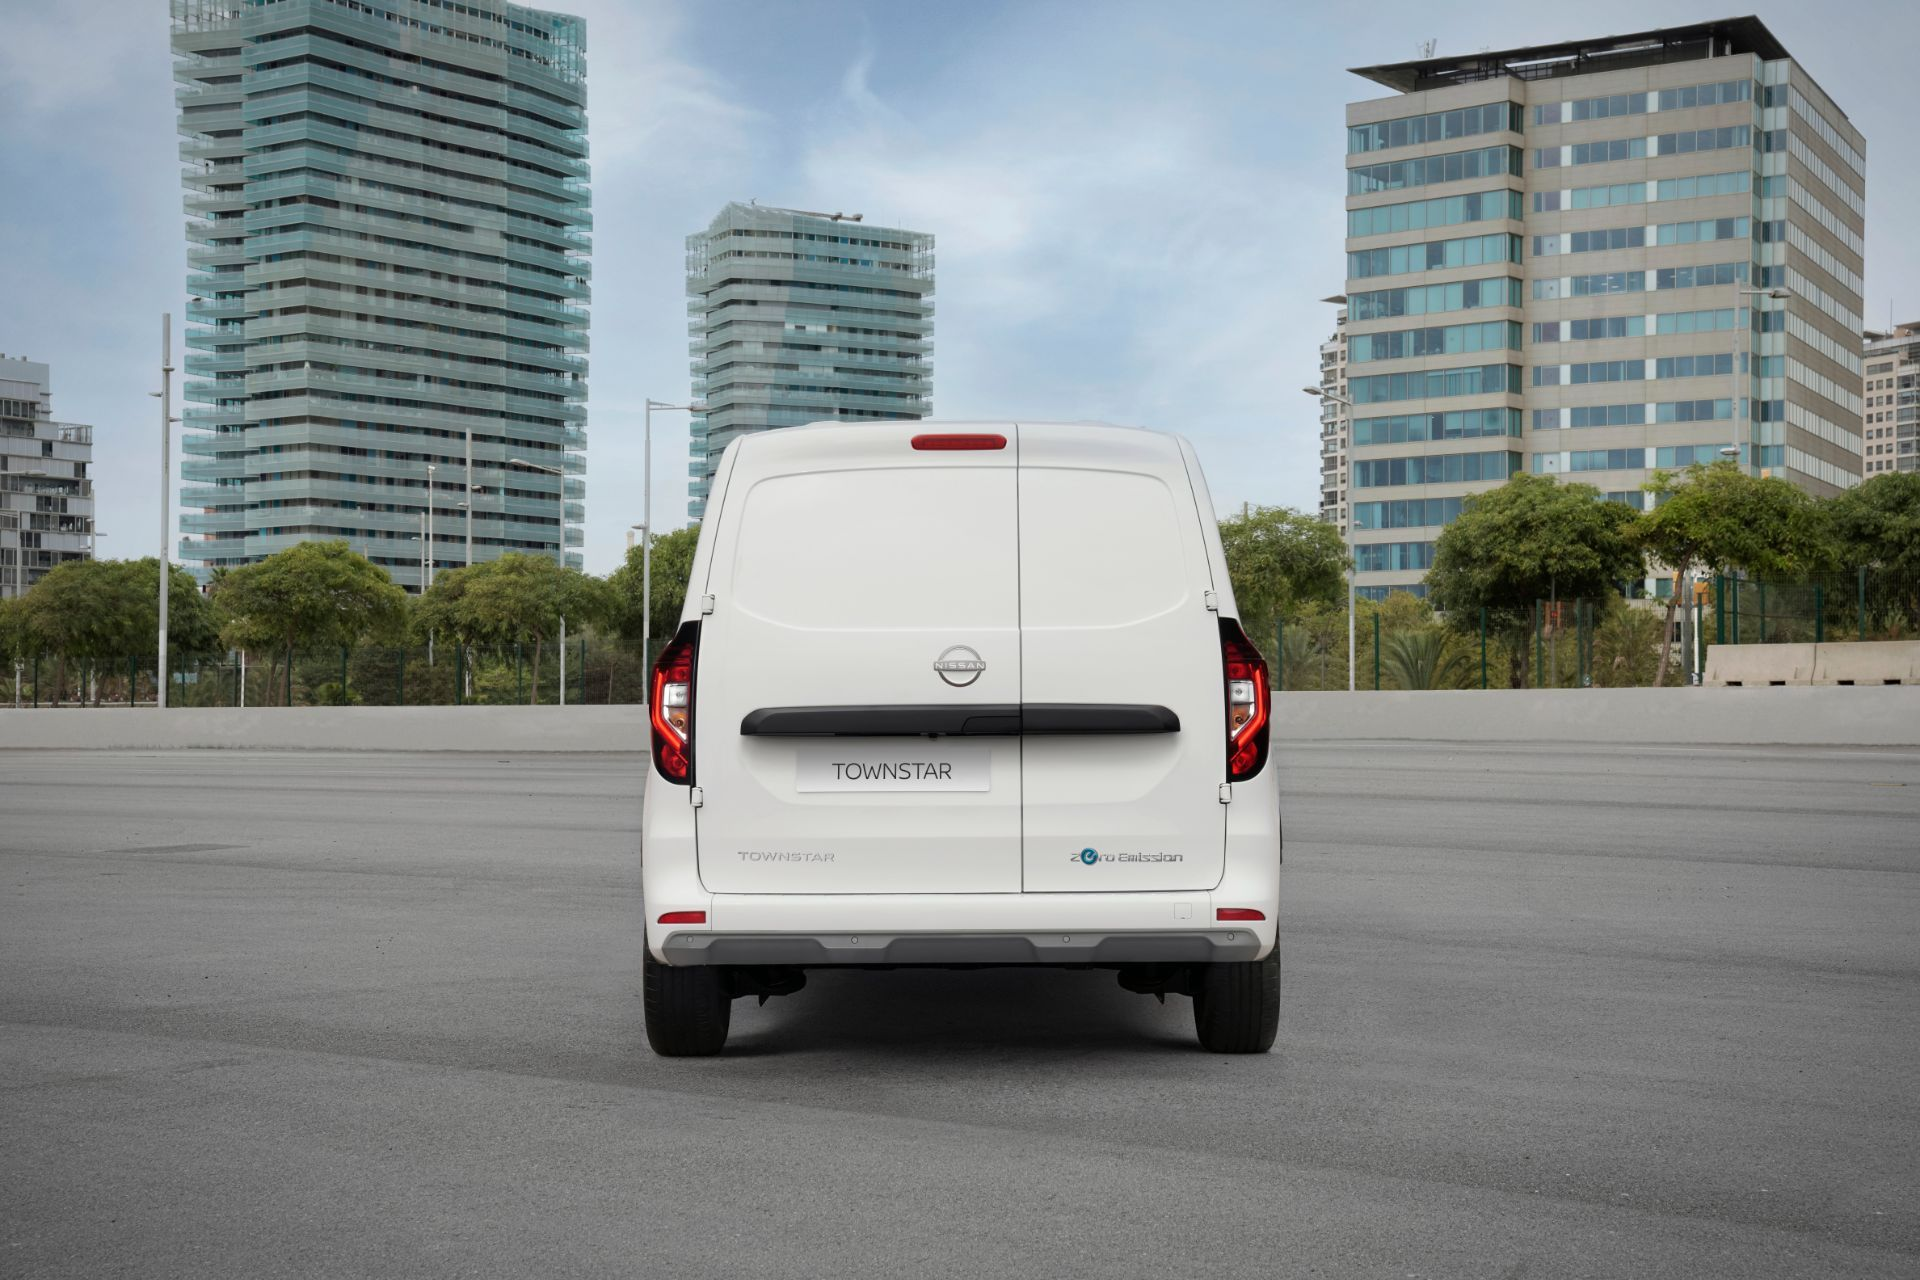 2022-Nissan-Townstar-EV-van-dynamic-9